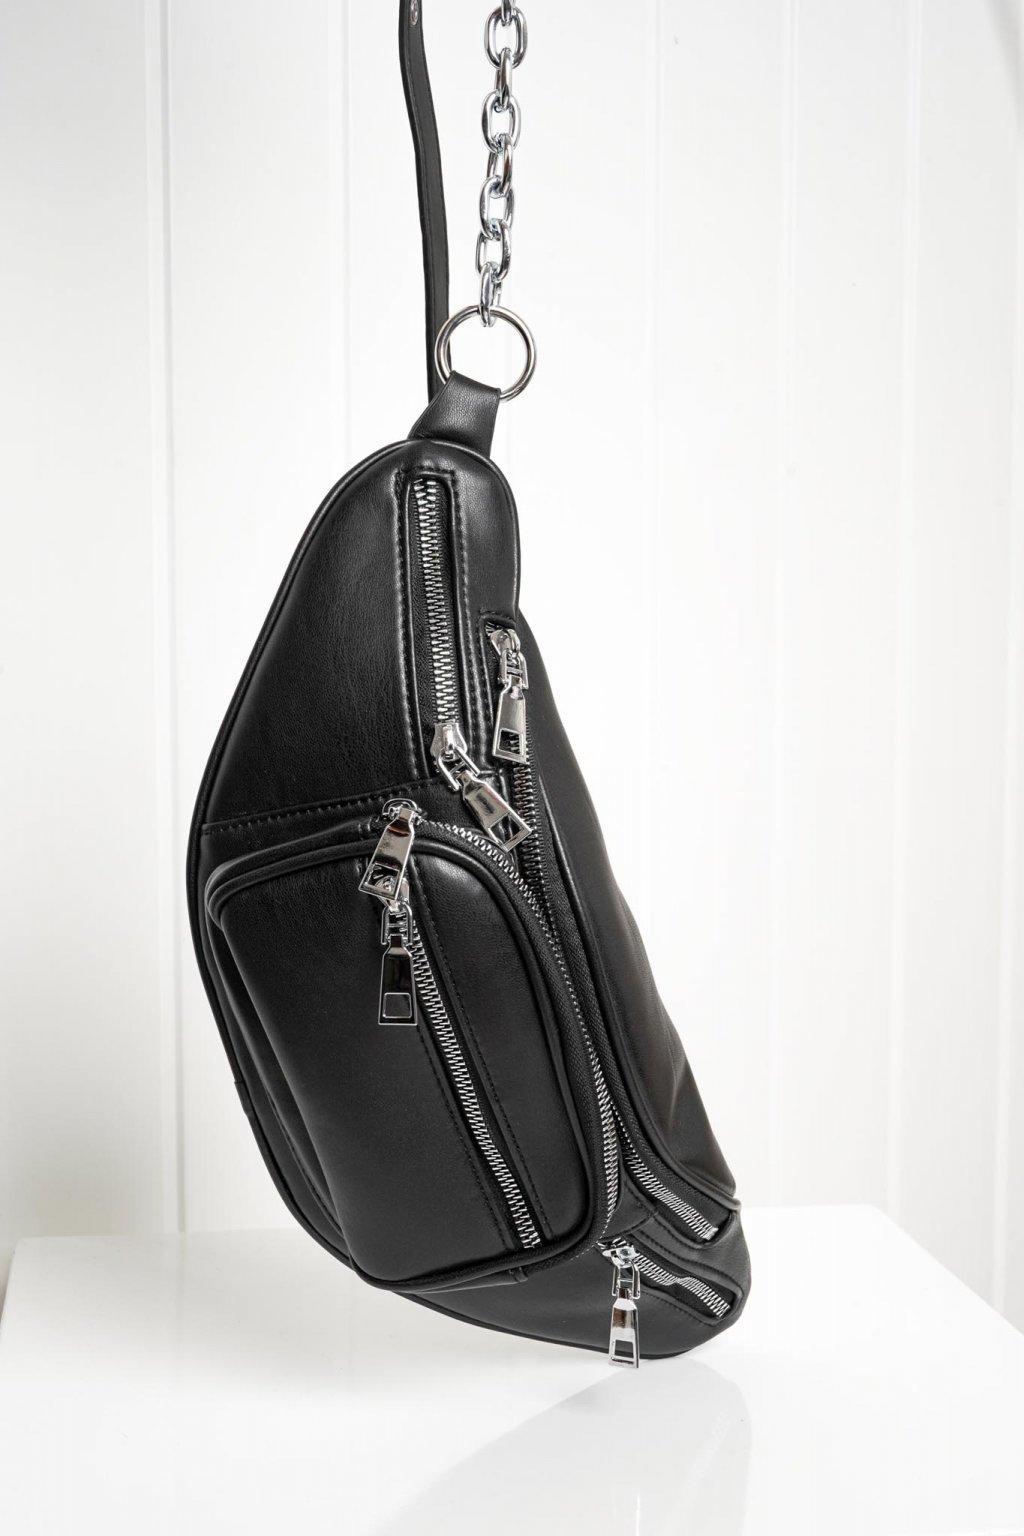 Kabelka, crossbody, ruksak, shopping bag, shopperka, 062